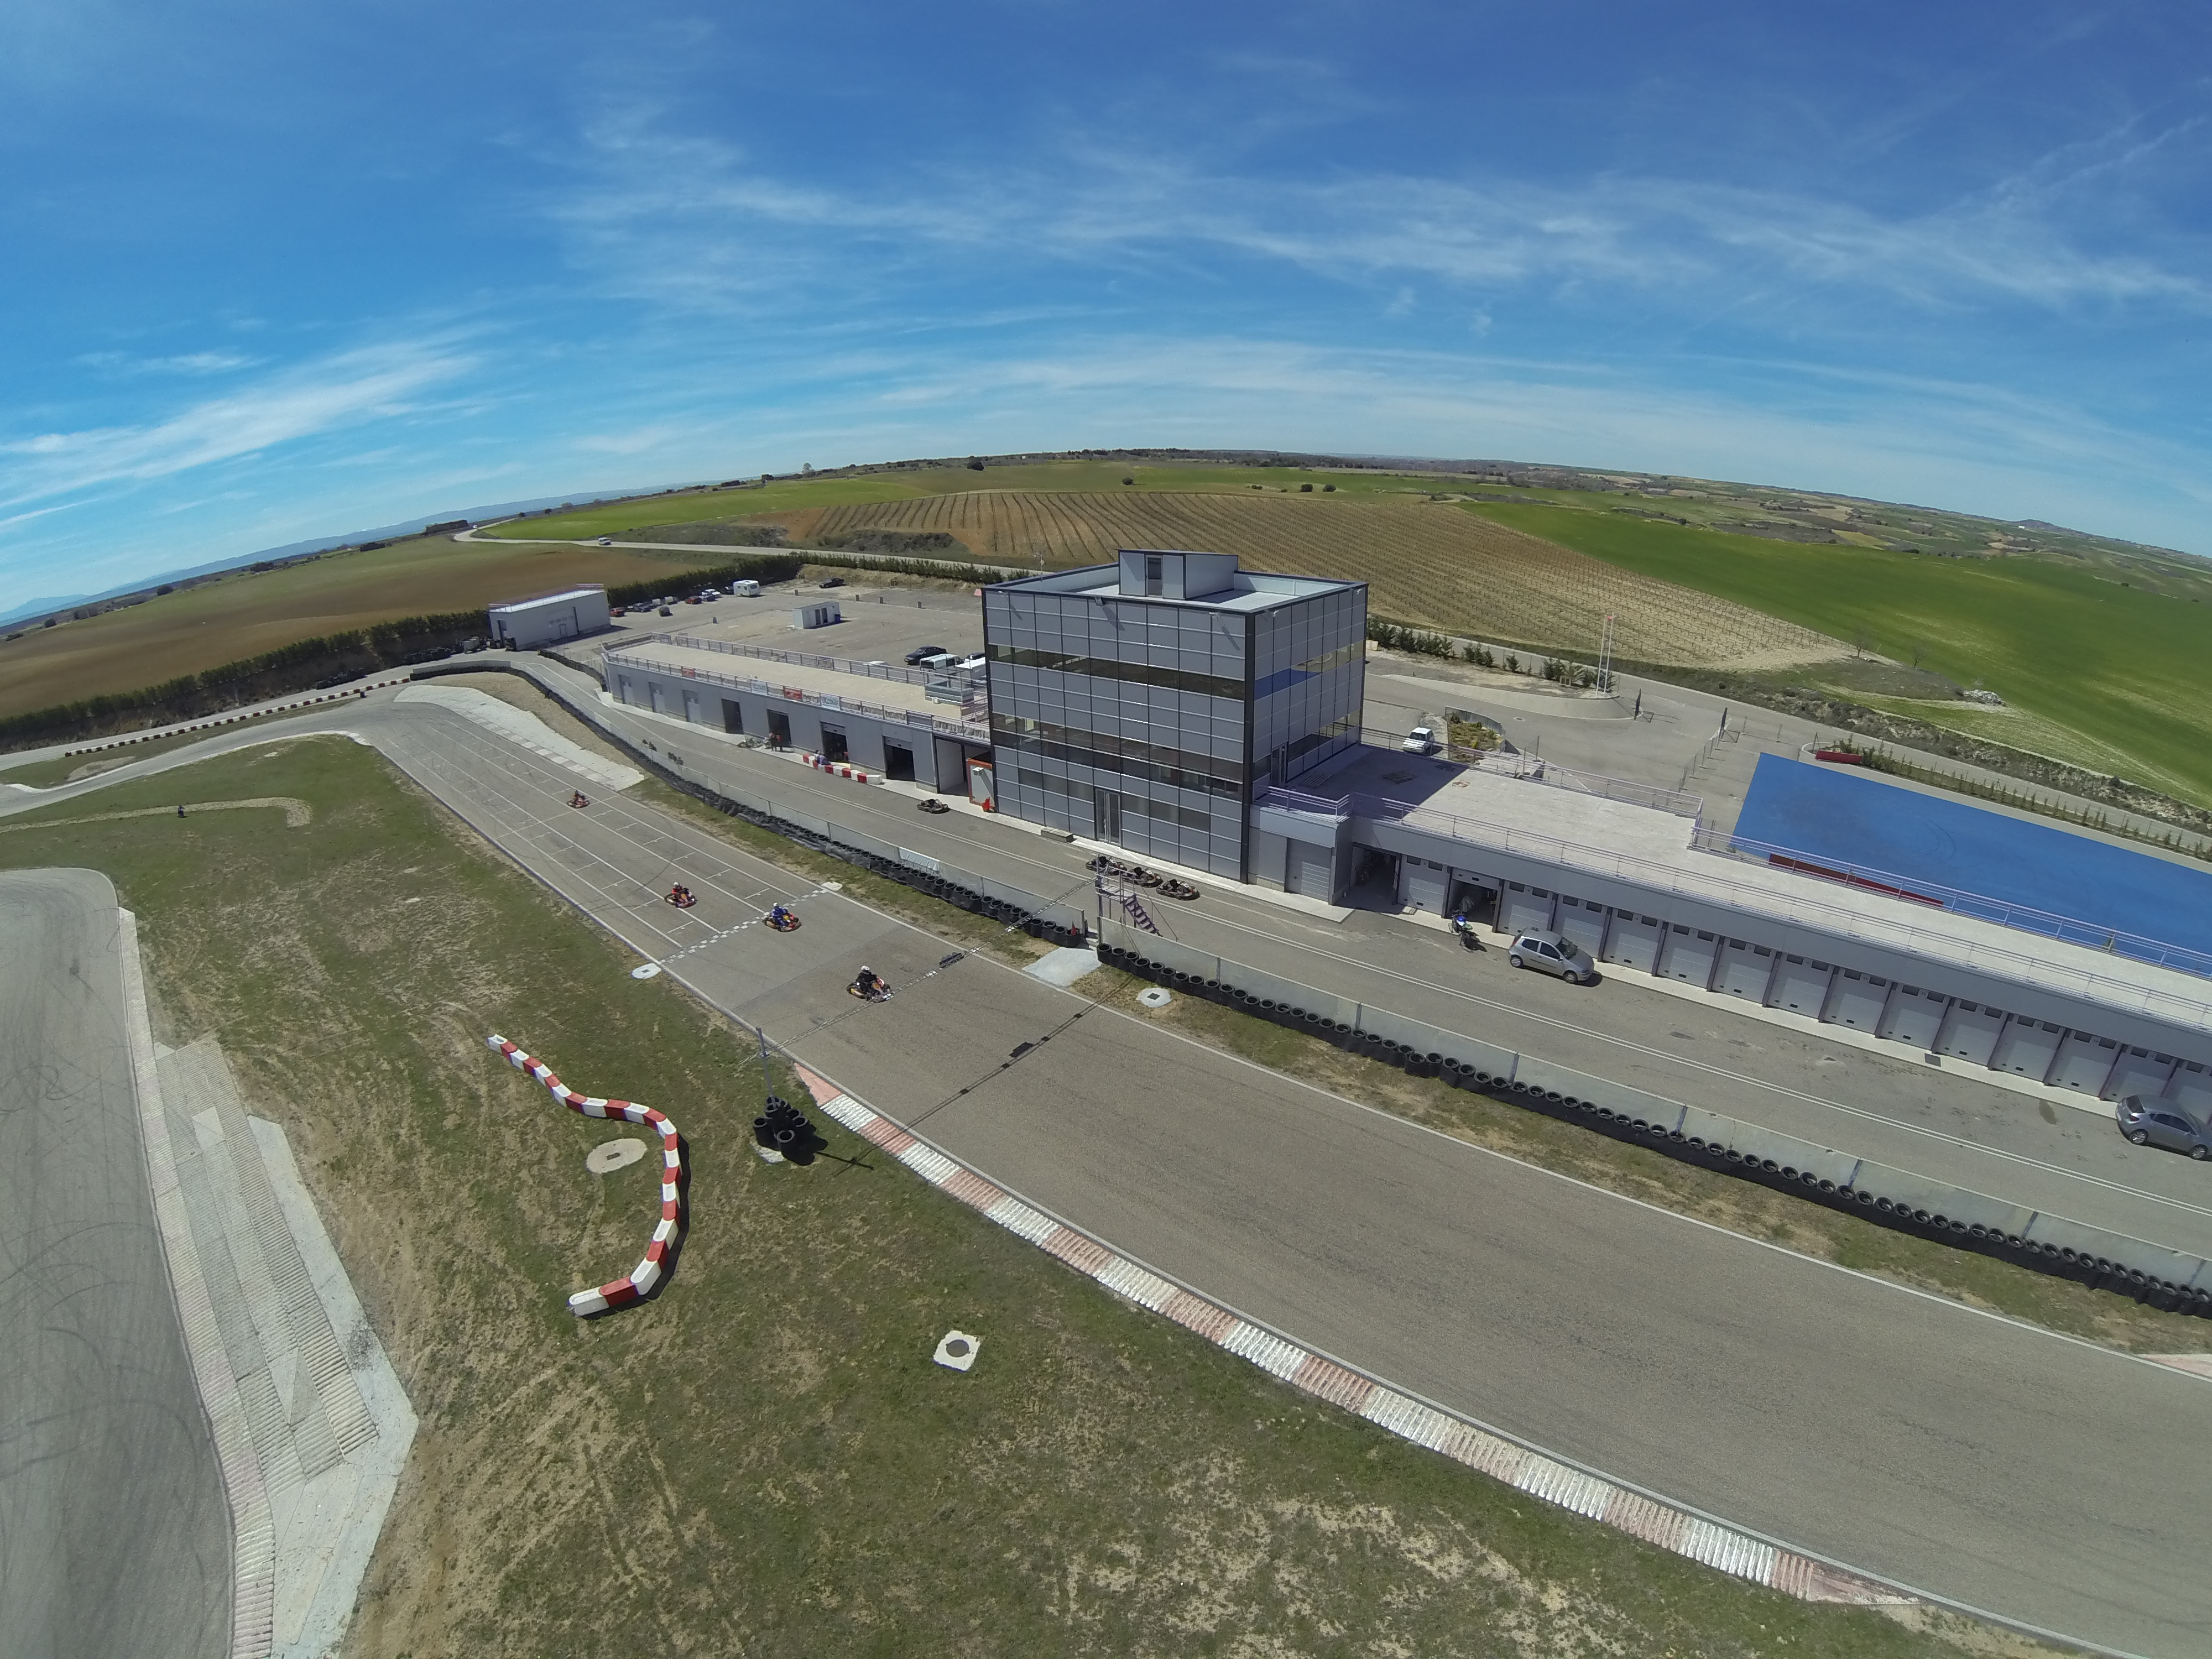 Circuito Kotarr : Circuito de velocidad kotarr ruta del vino ribera del duero